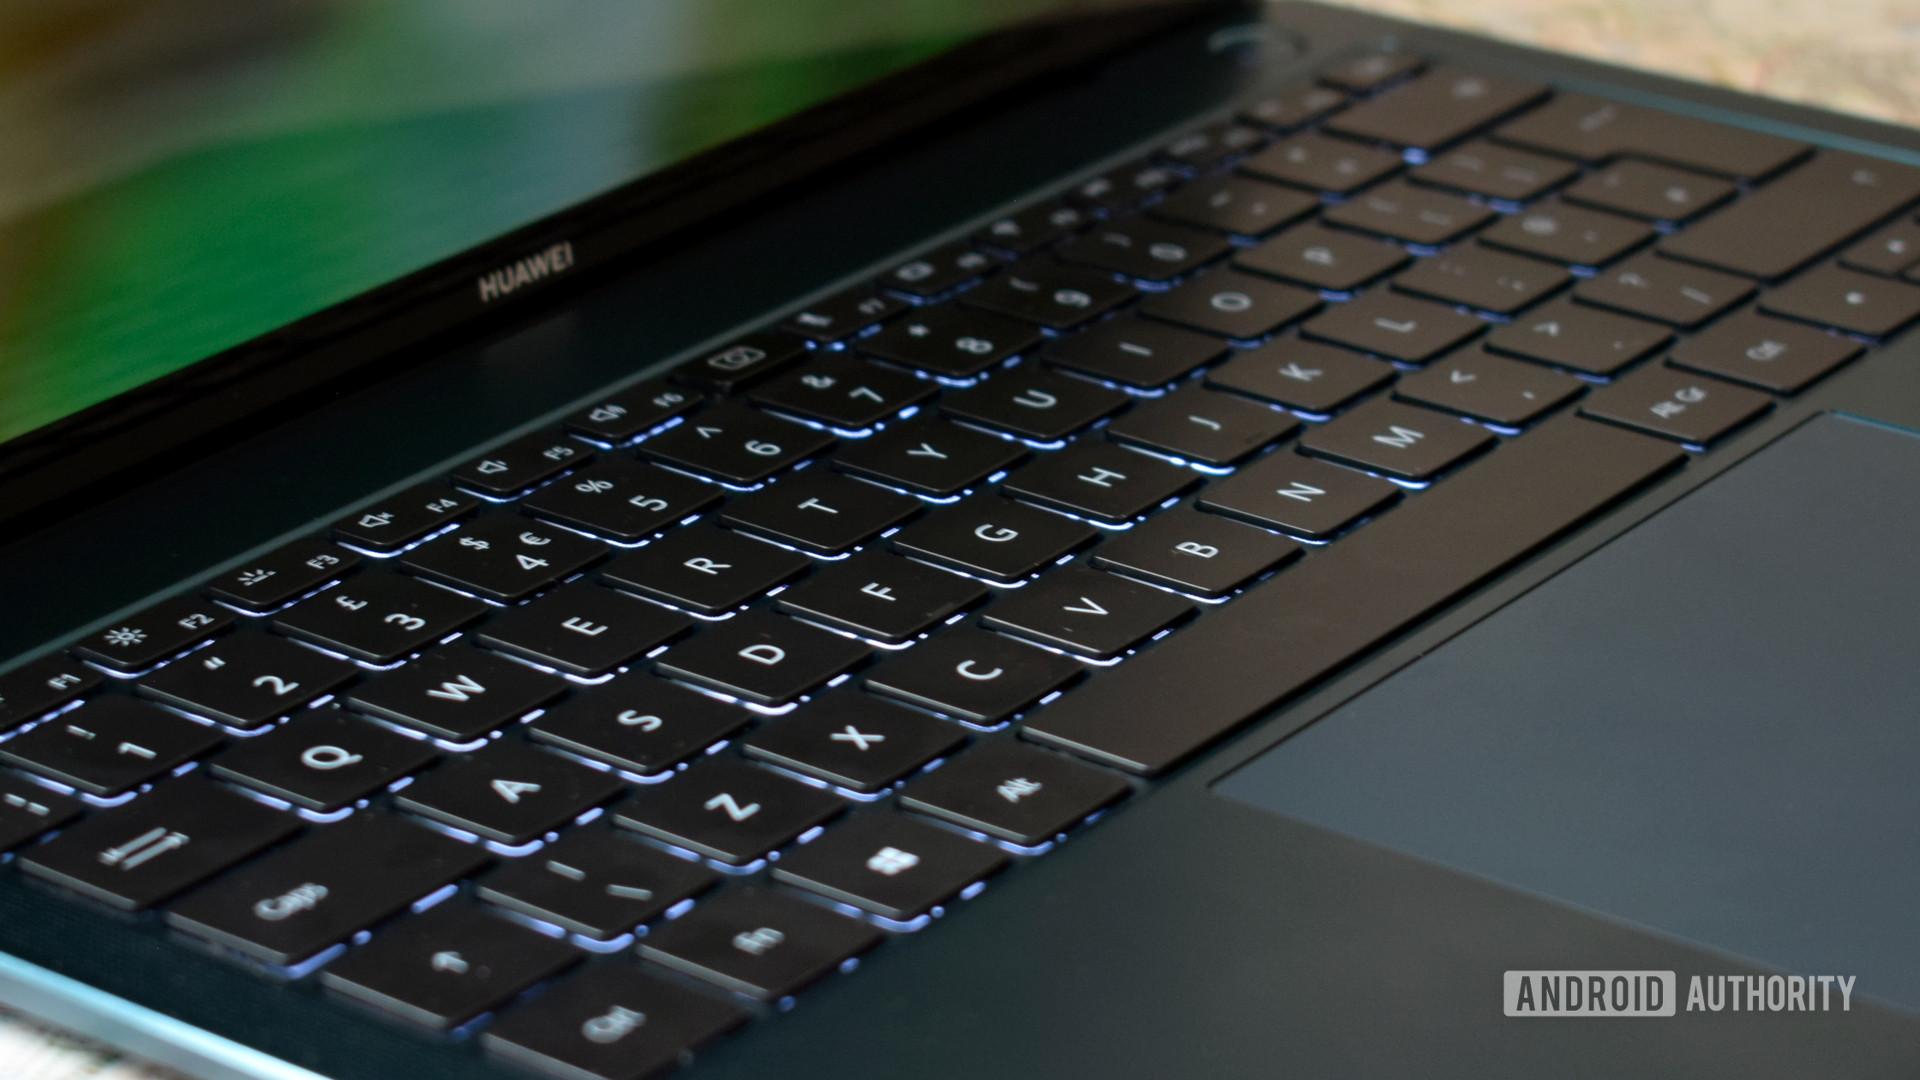 Huawei MateBook X Pro 2021 keyboard